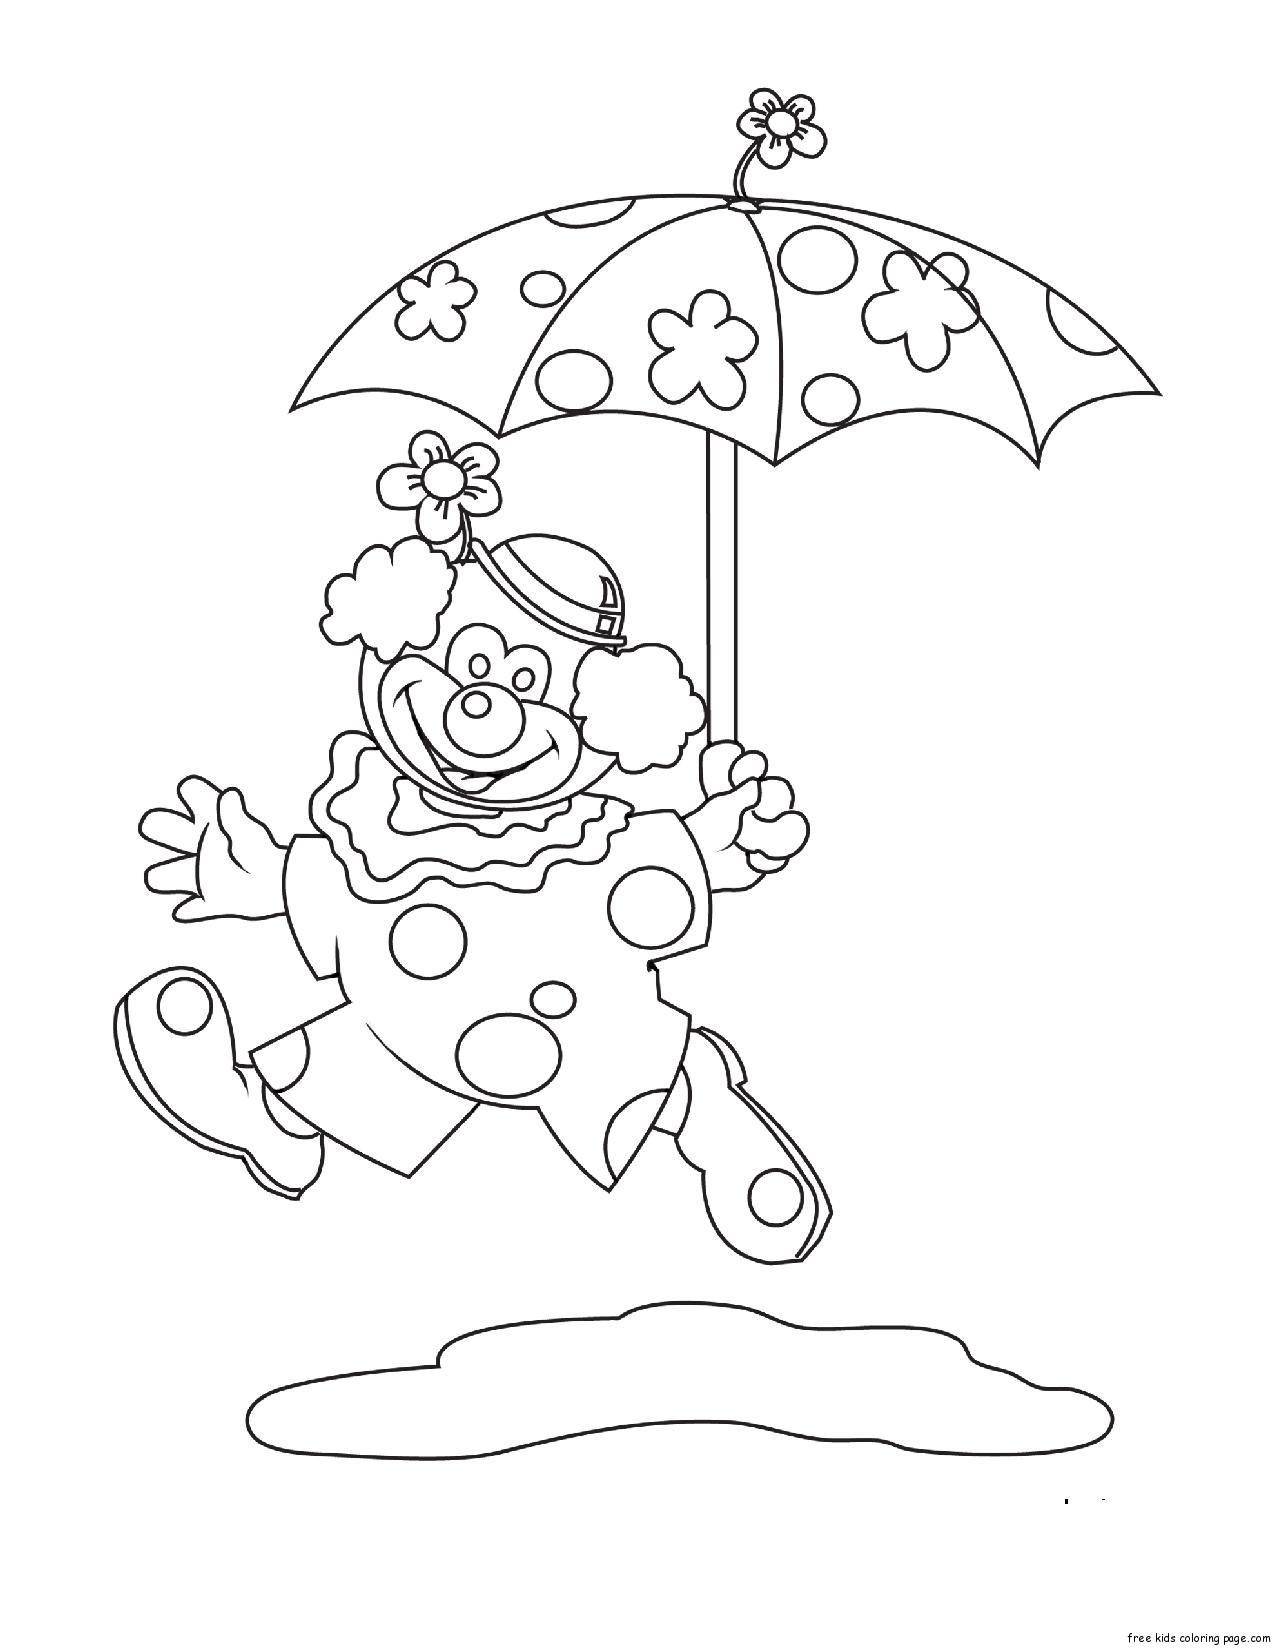 Printable Coloring Pages Clown Umbrella Free Printable